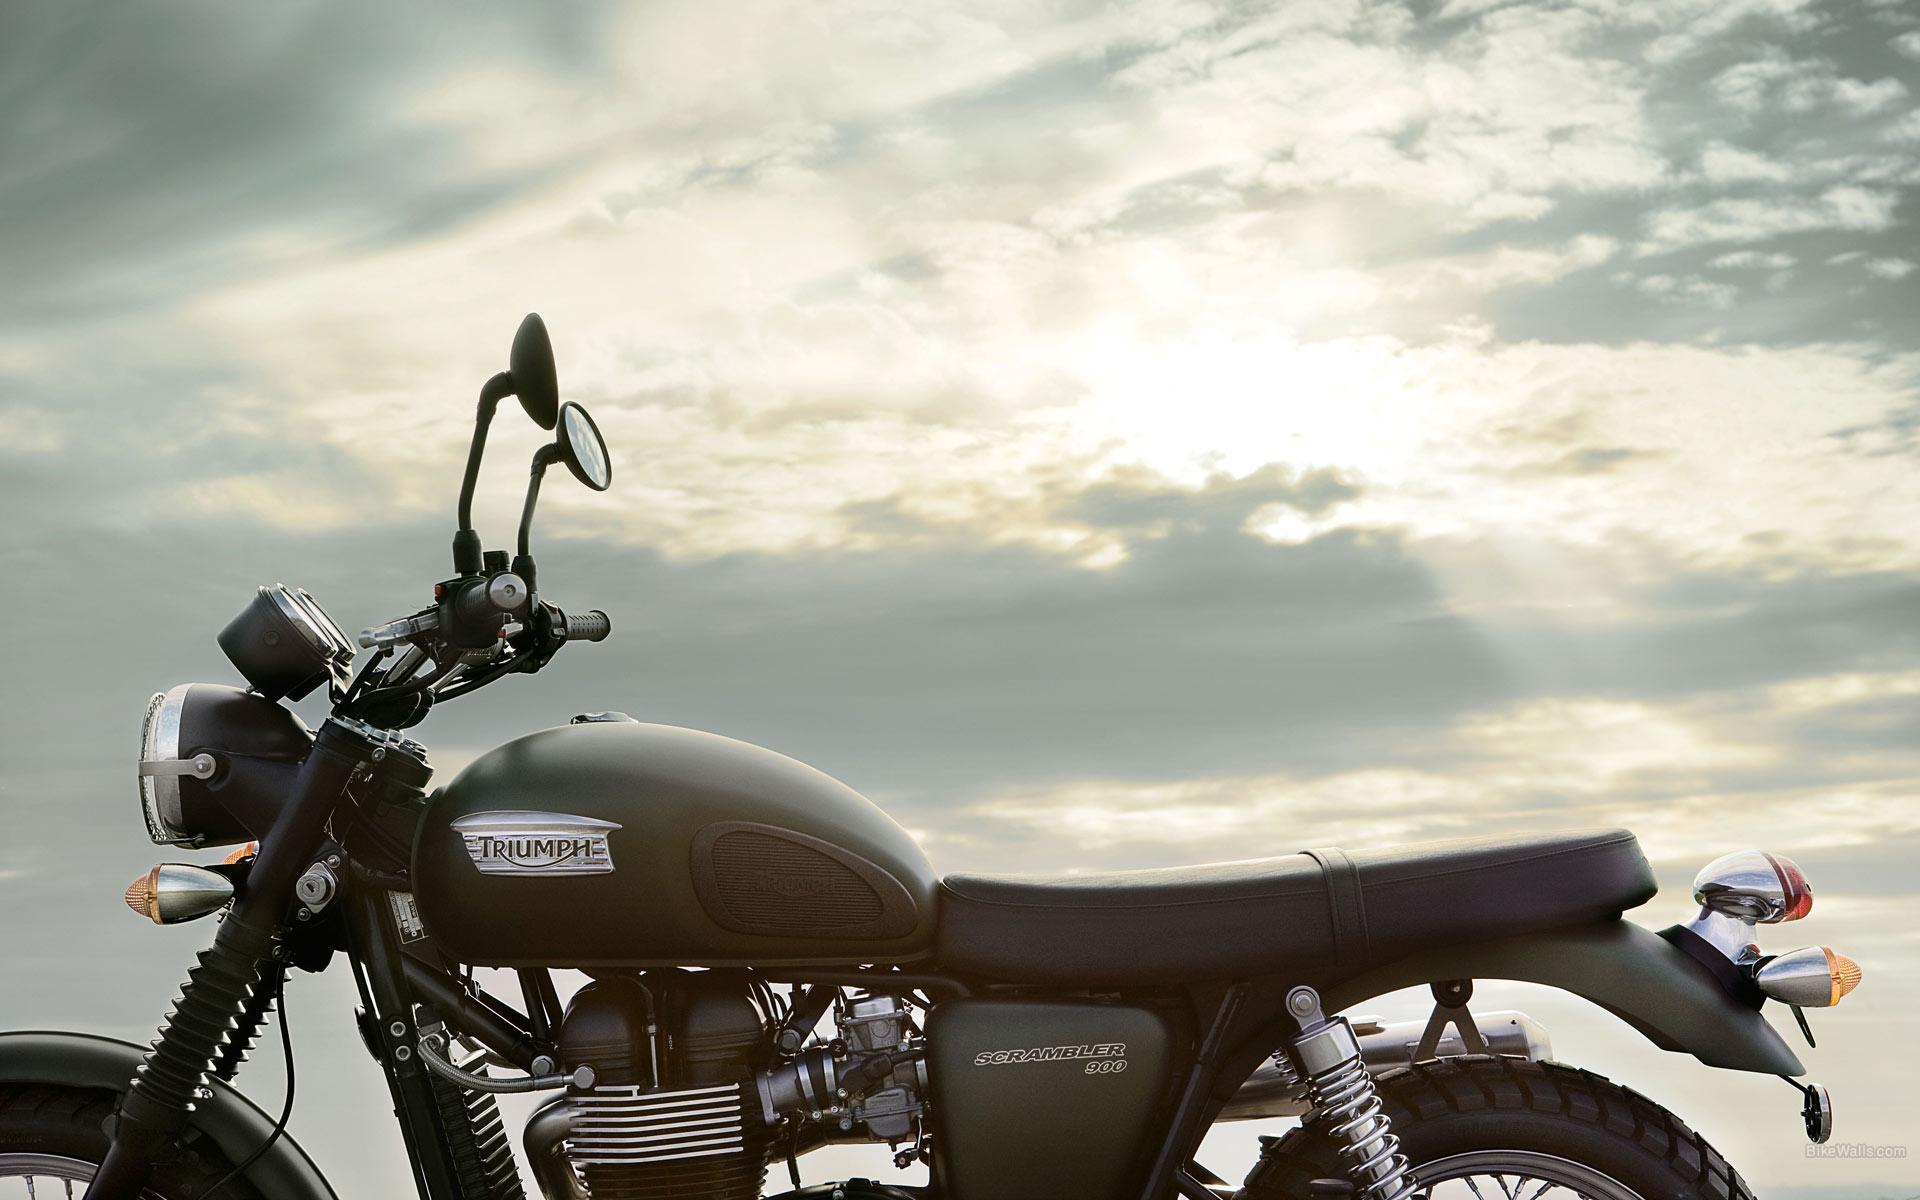 Обои motorcycle. Мотоциклы foto 18